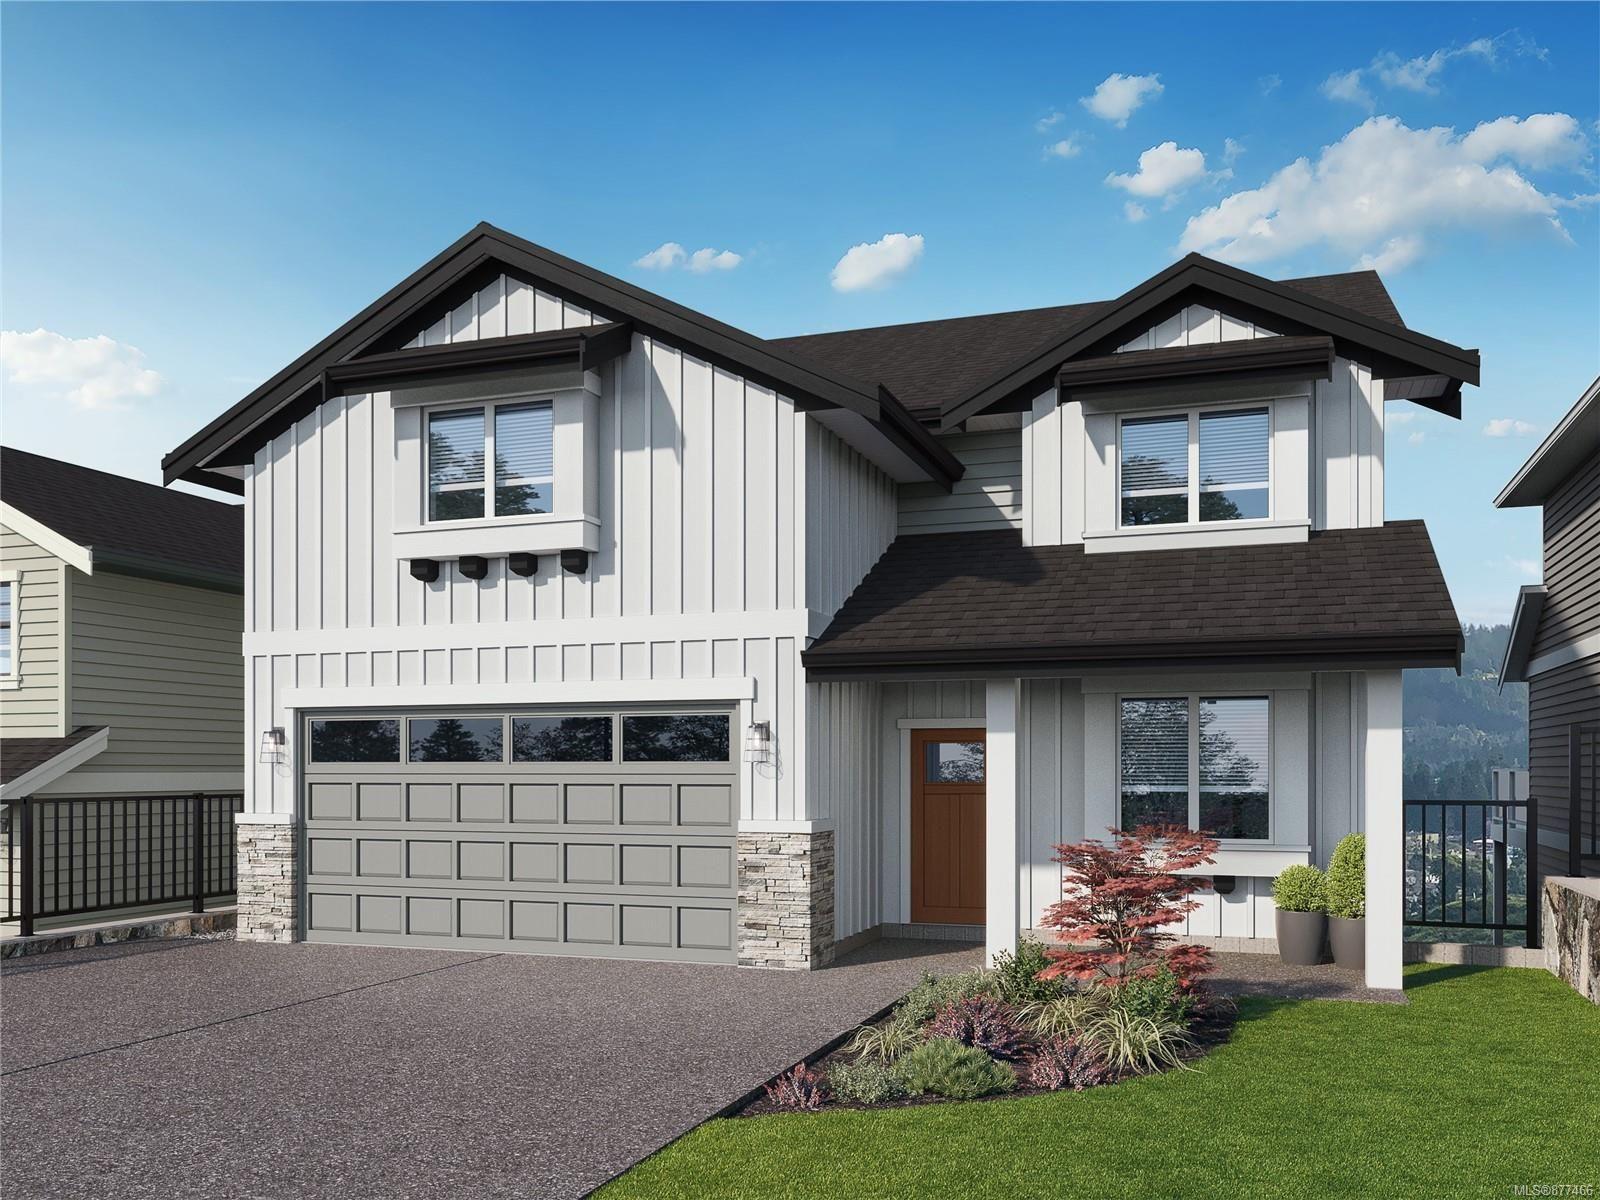 Main Photo: 1387 Flint Ave in : La Bear Mountain House for sale (Langford)  : MLS®# 877466